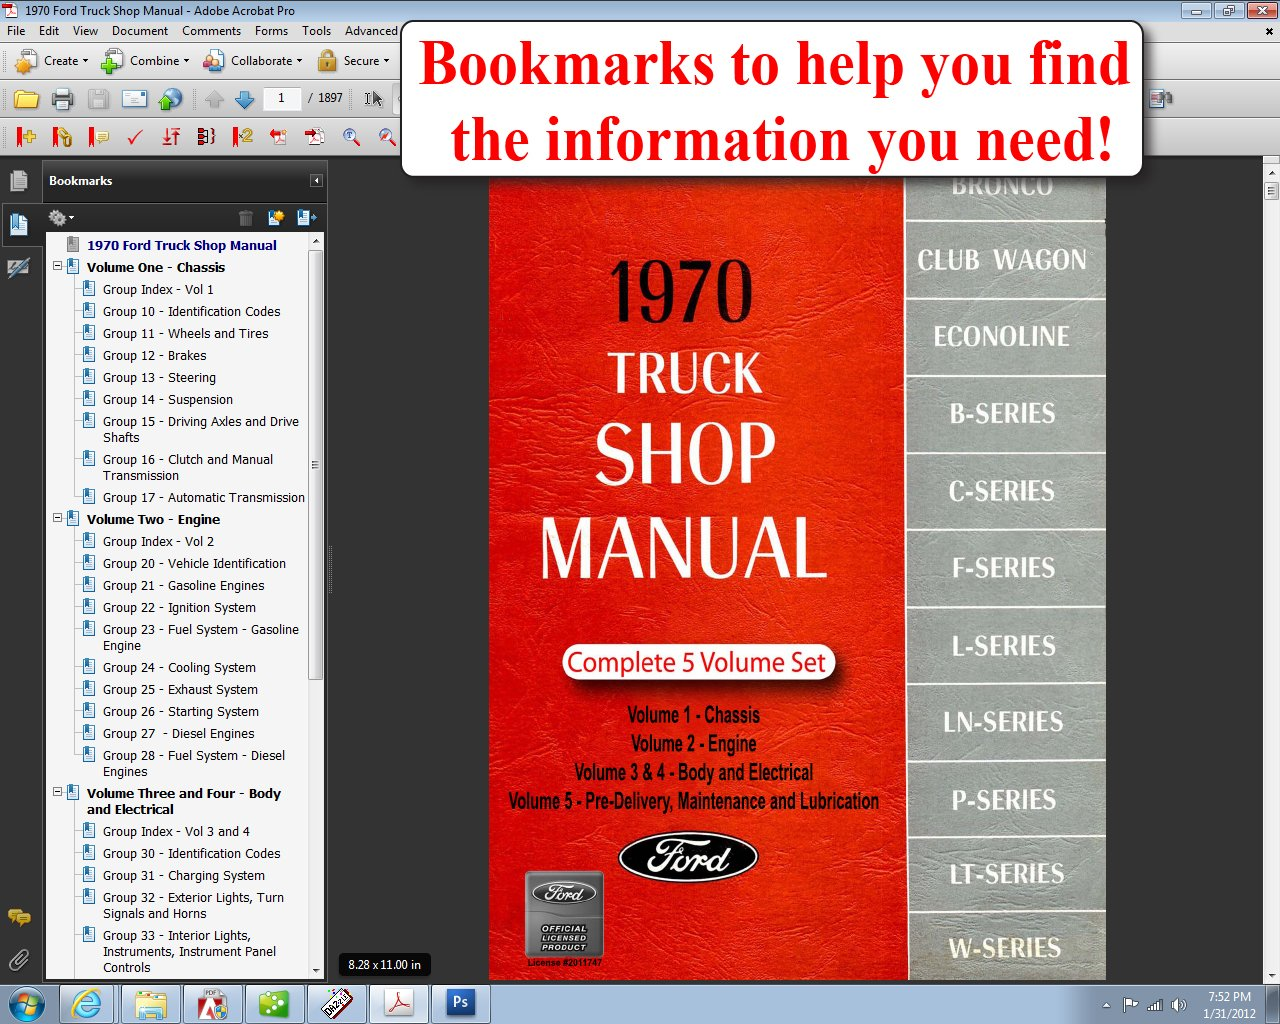 1970 Ford Truck Shop Manual Motor Company David E Leblanc F100 9781603710787 Books